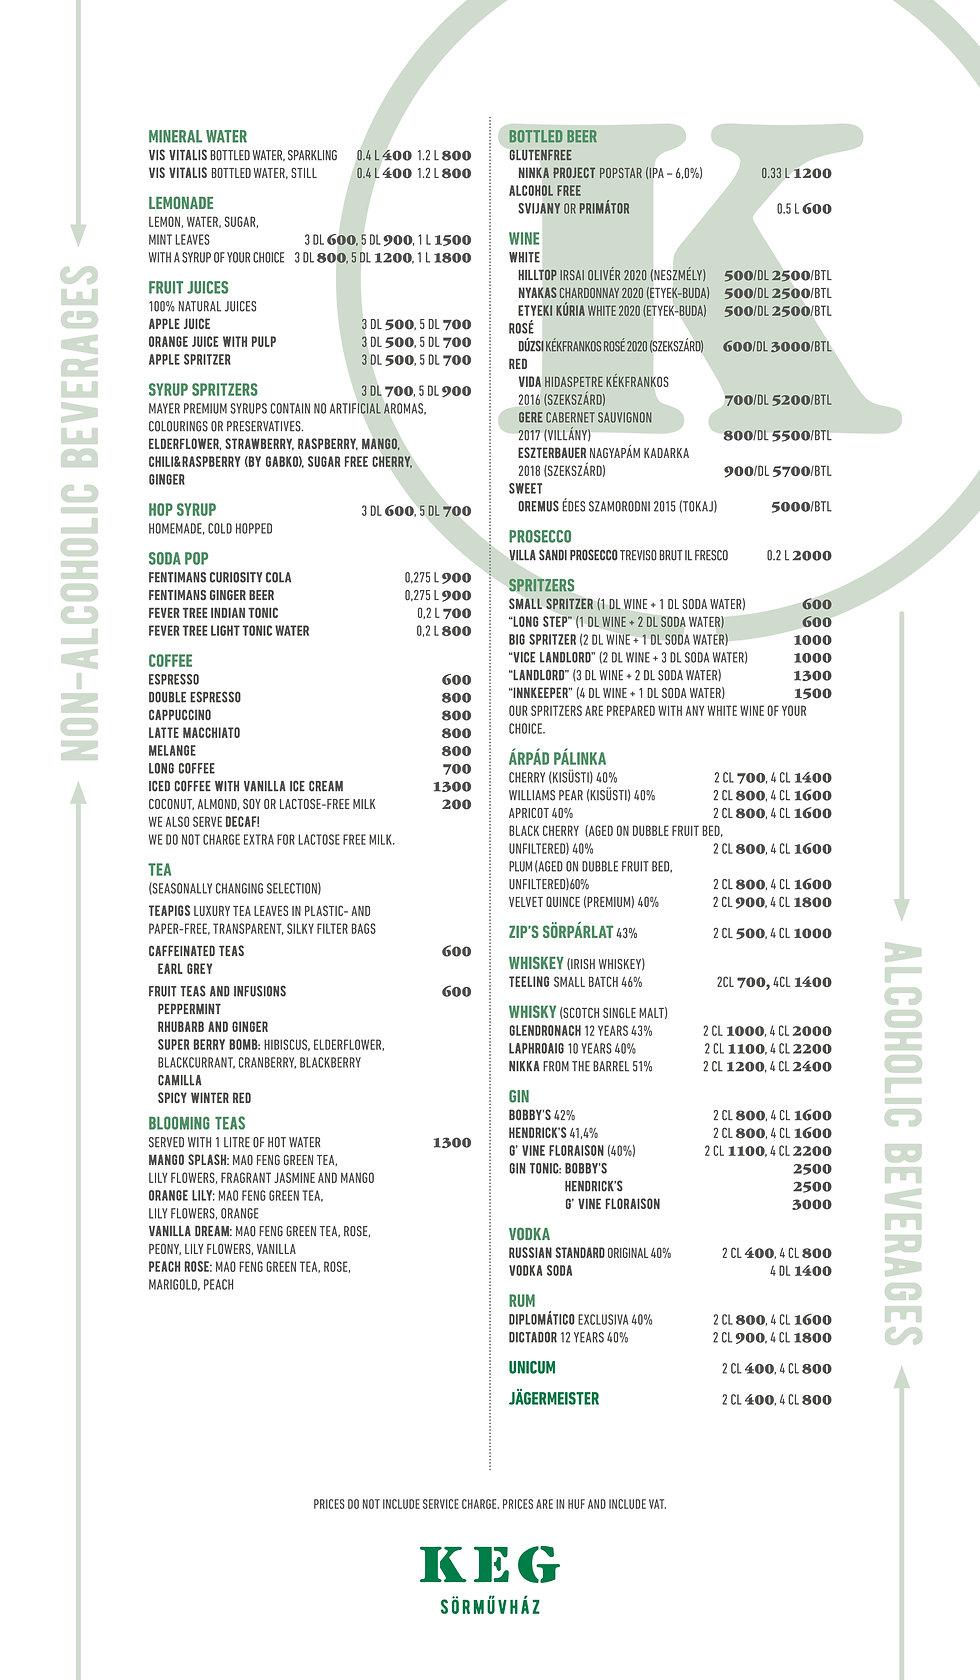 keg_sormuvhaz_menu_itallap_eng_2021_102.jpg